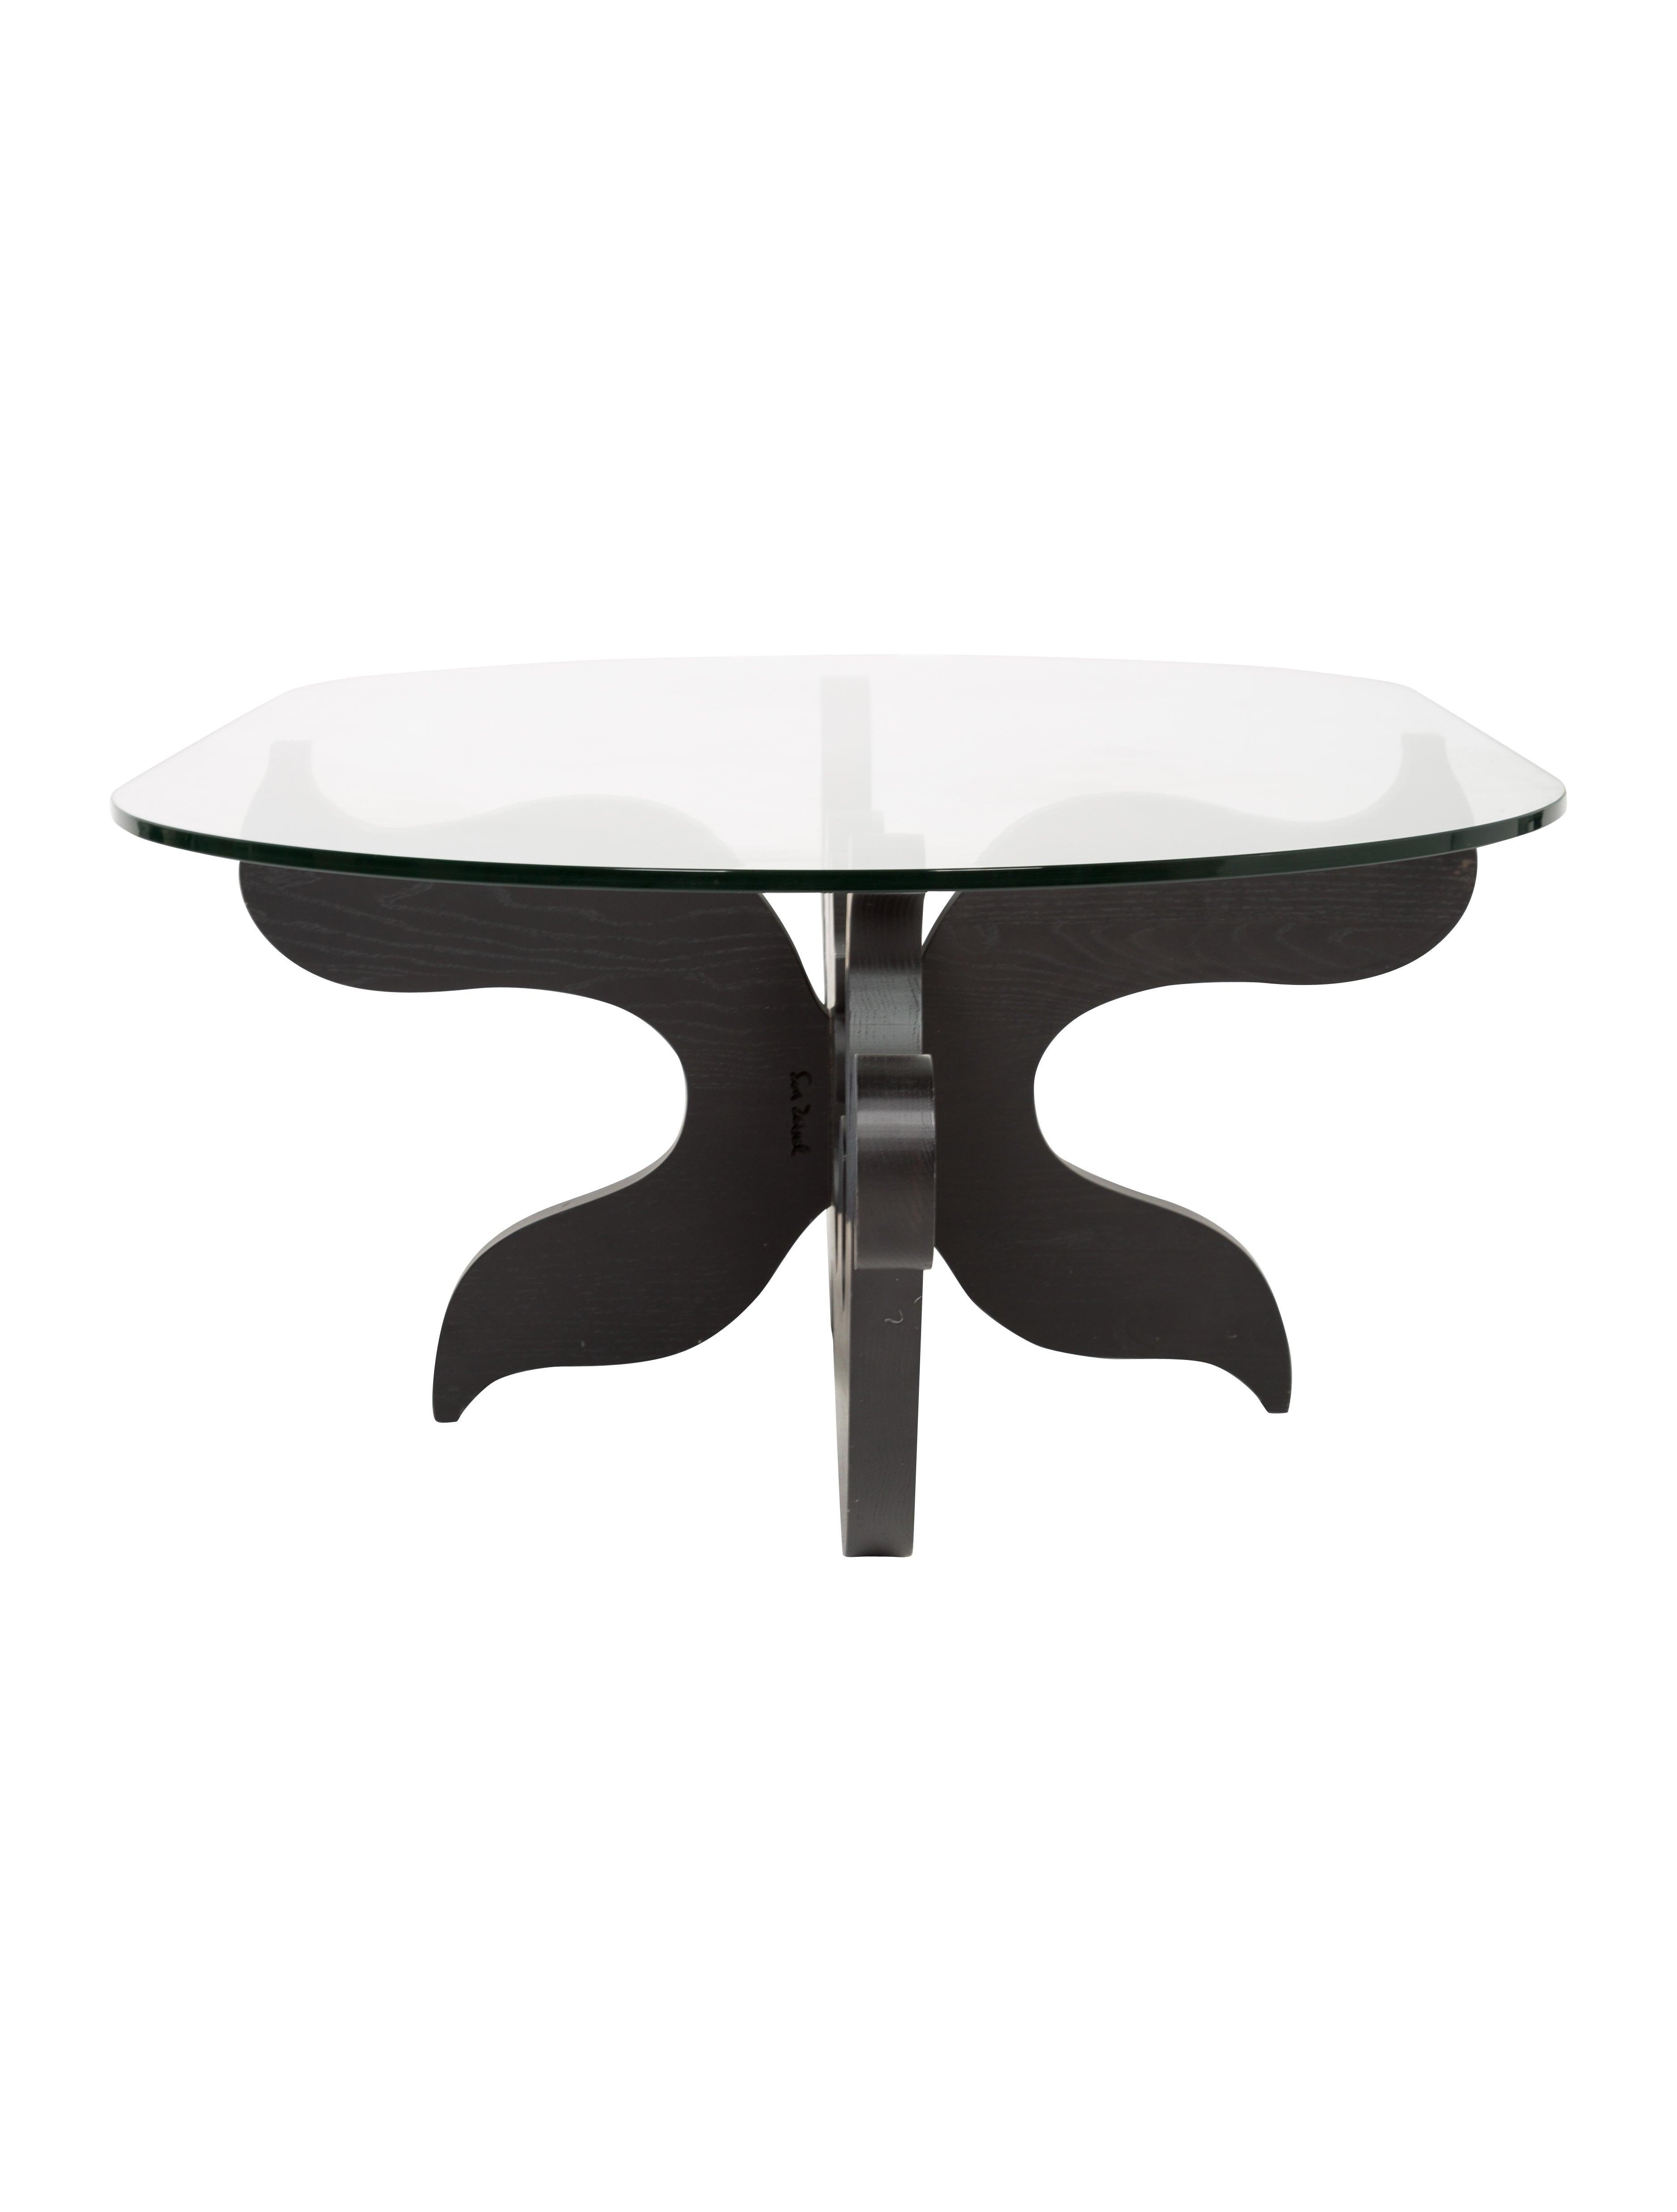 Design Within Reach Eva Zeisel Coffee Table Furniture DESWR20093